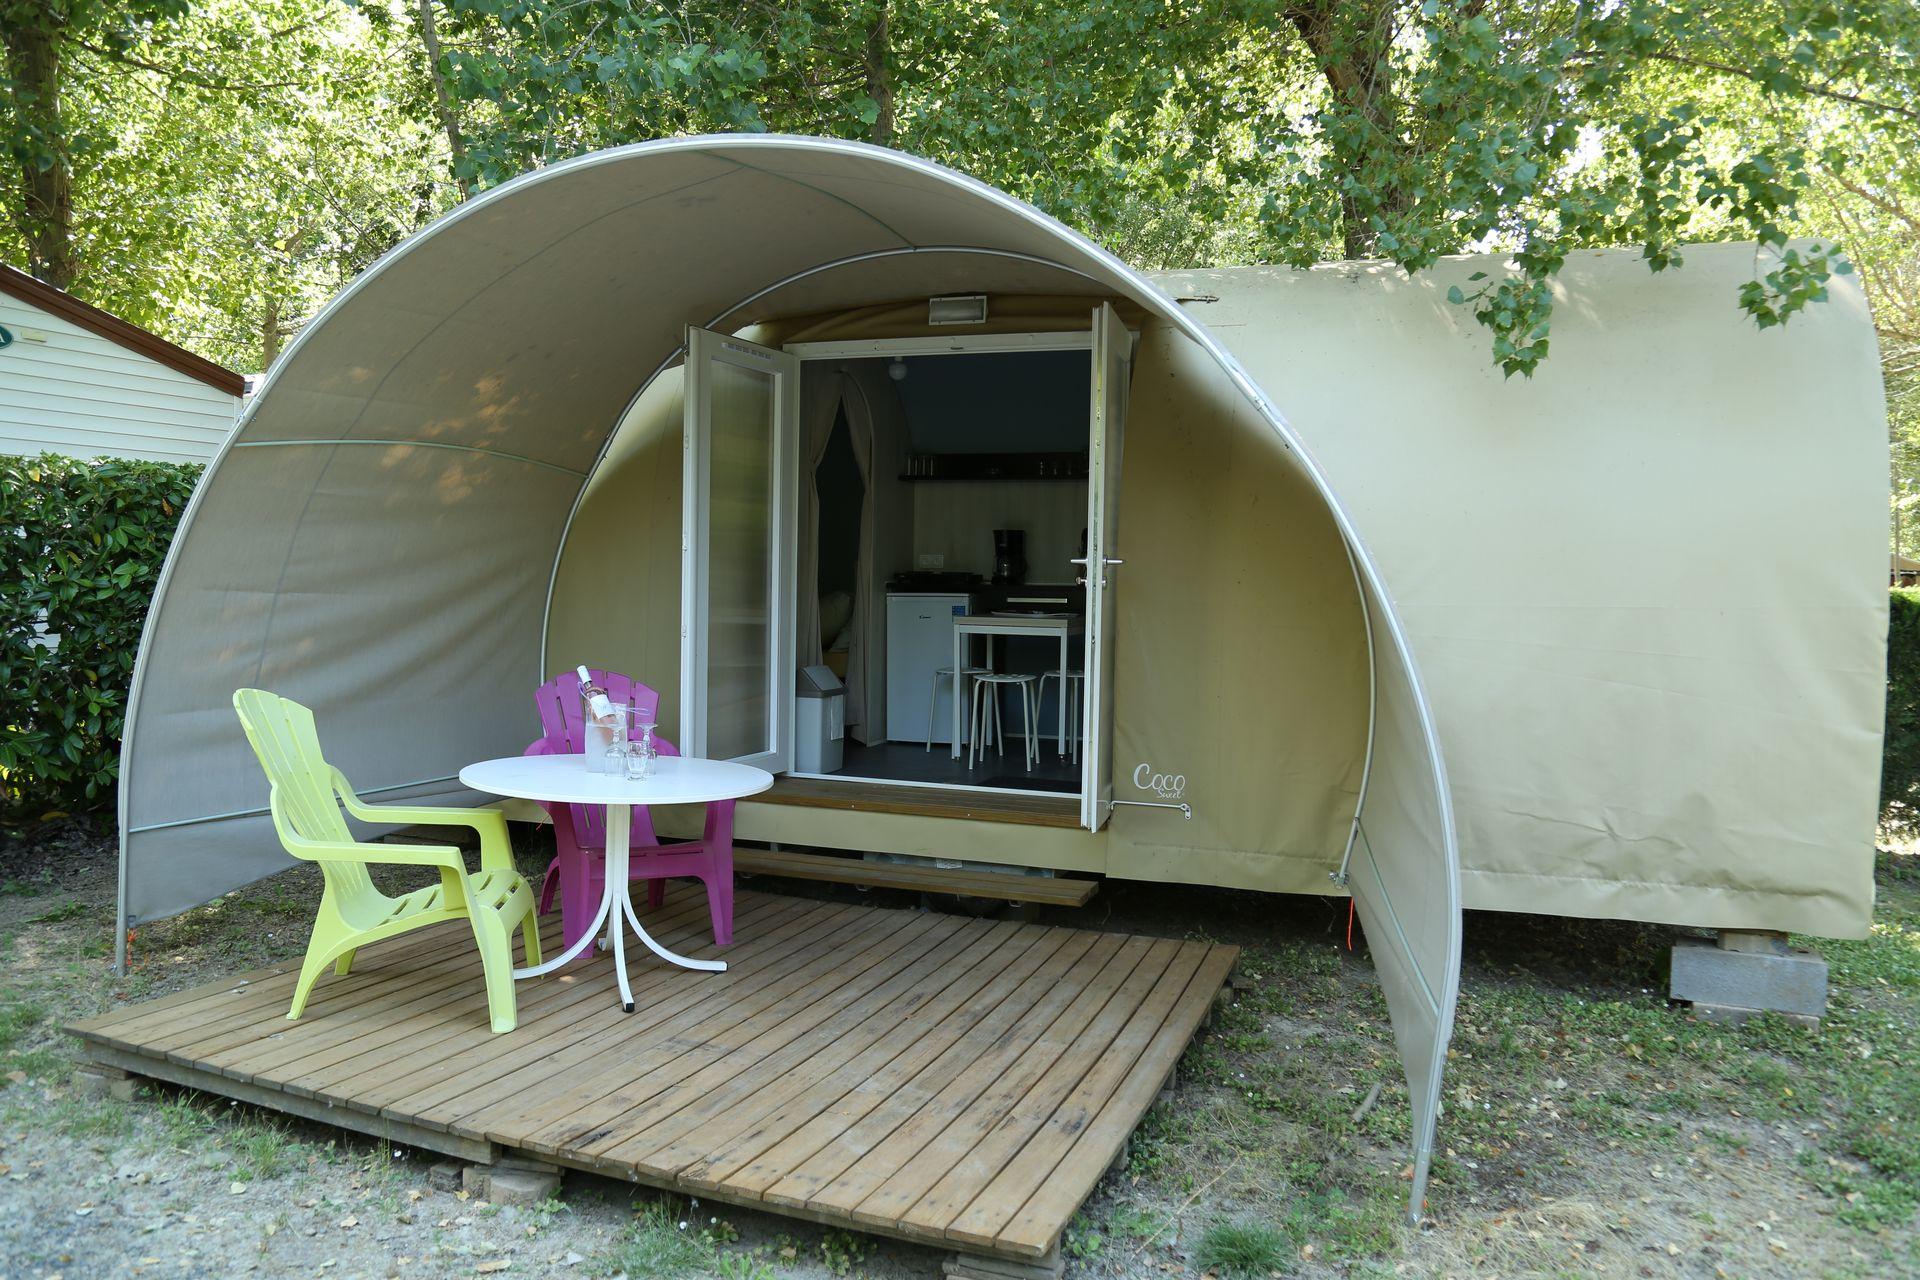 Tente Camping Les Berges du Canal